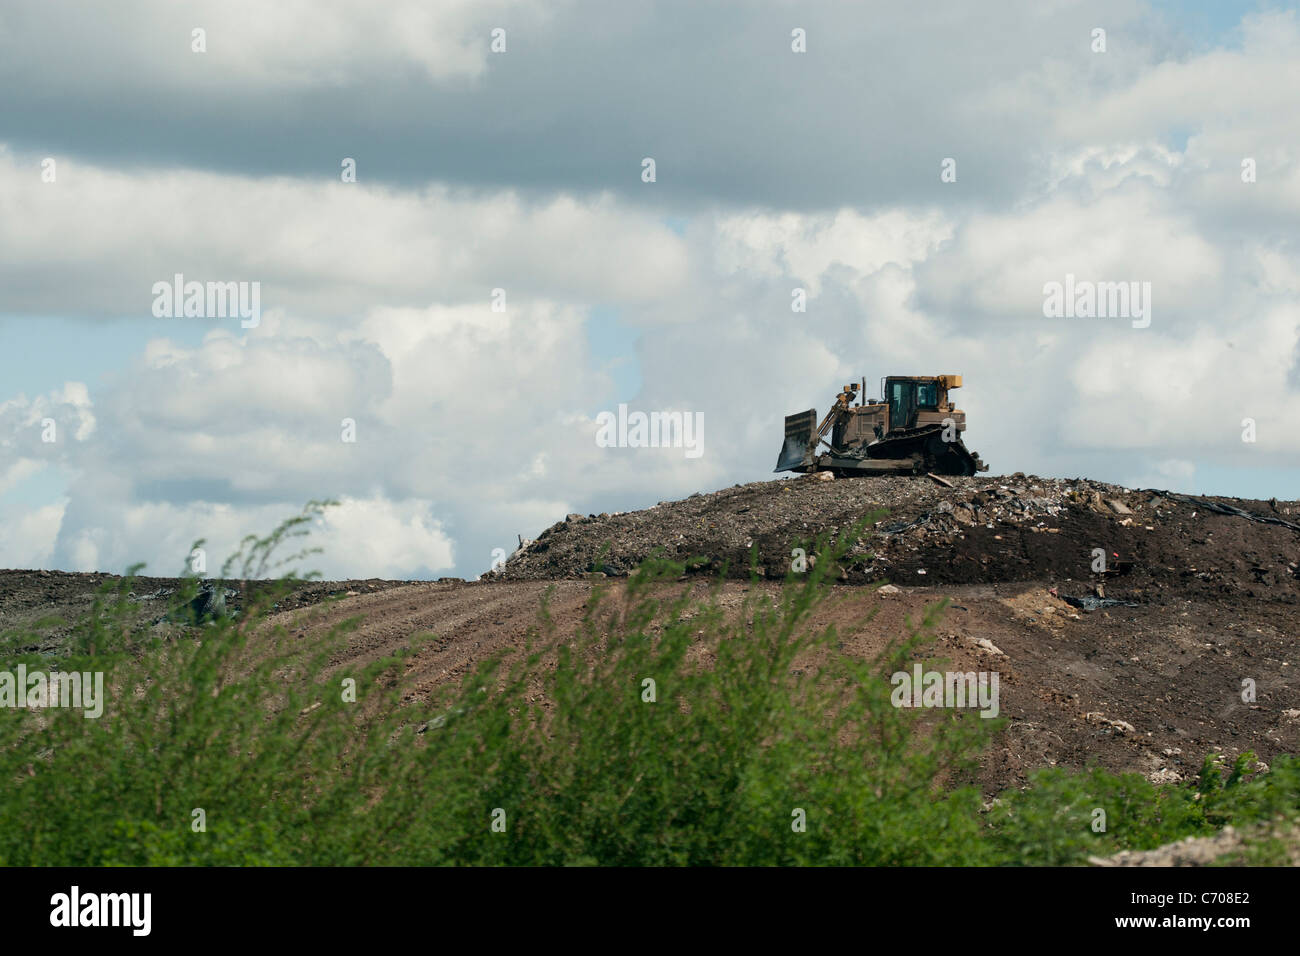 bulldozer on landfill - Stock Image